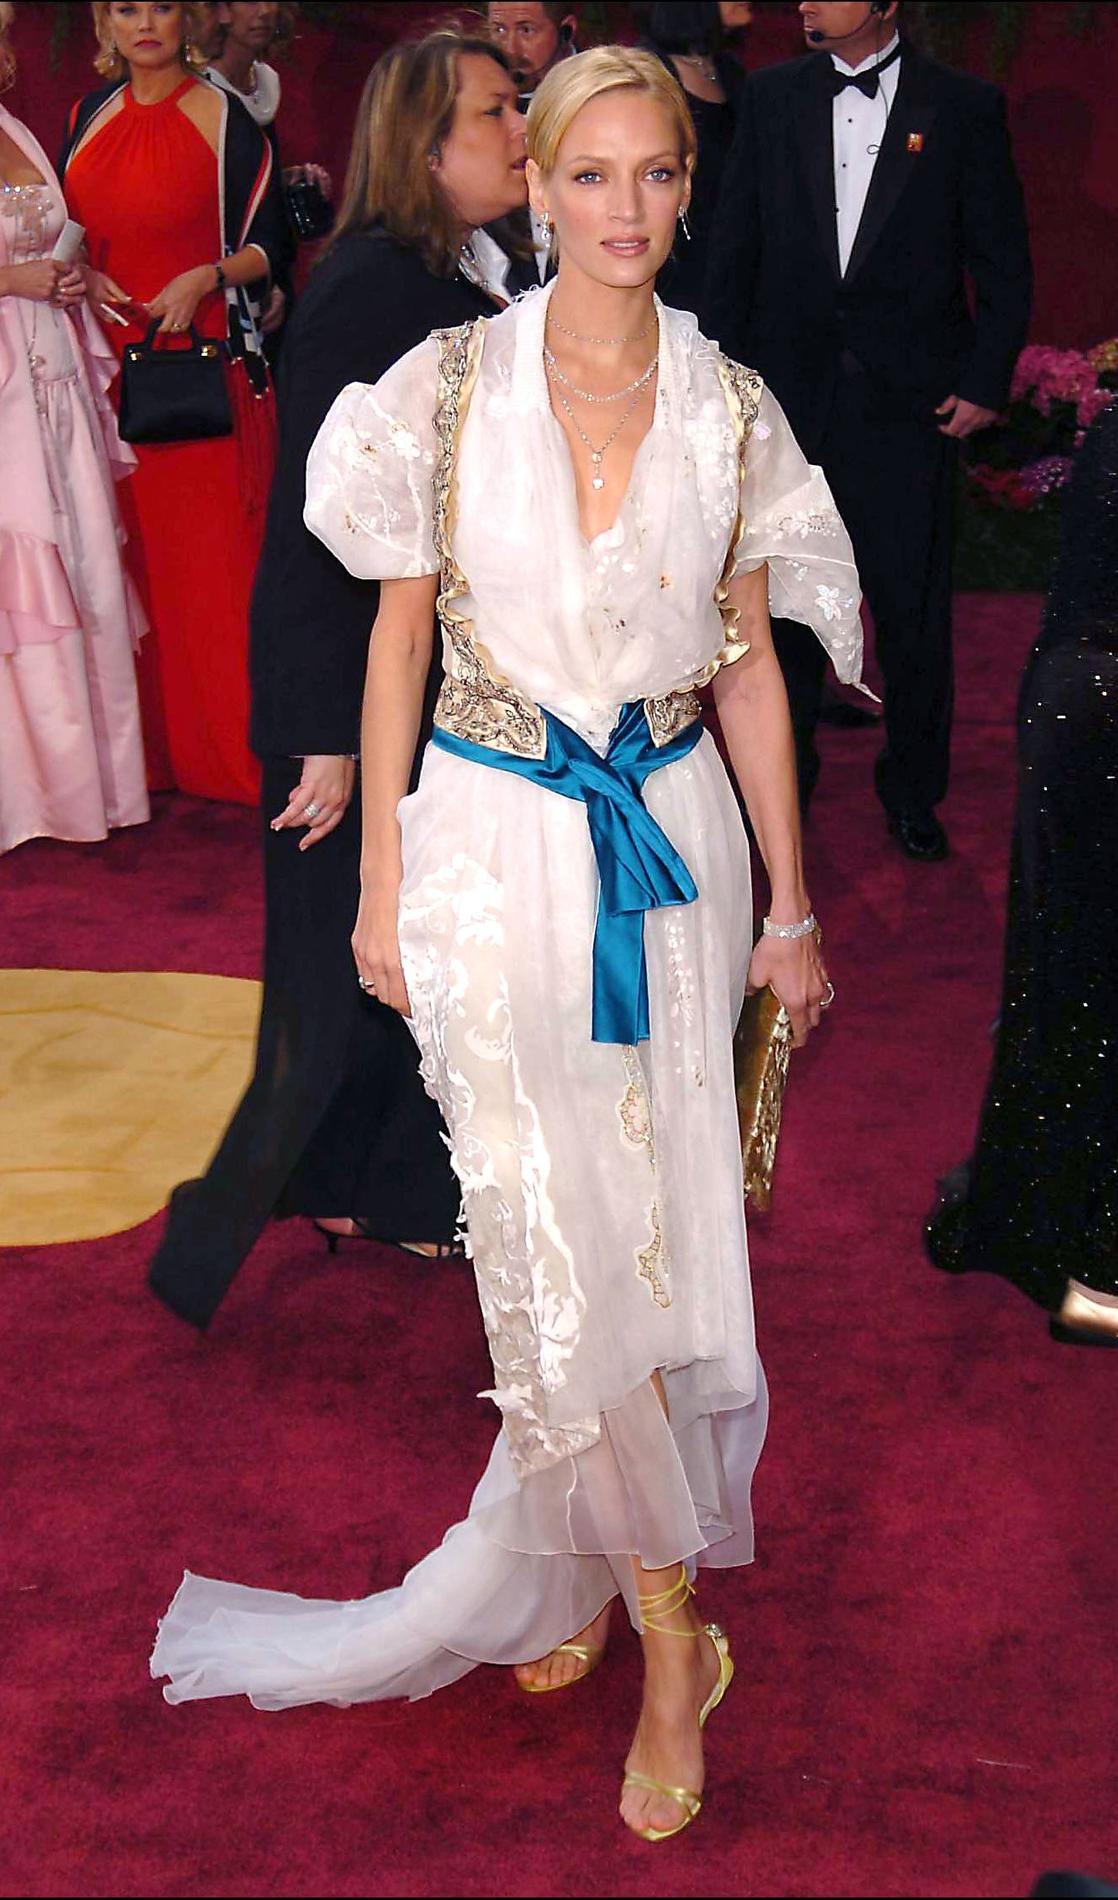 b05dd4809c2 ... Les pires robes des Oscars à travers l histoire - Uma Thurman